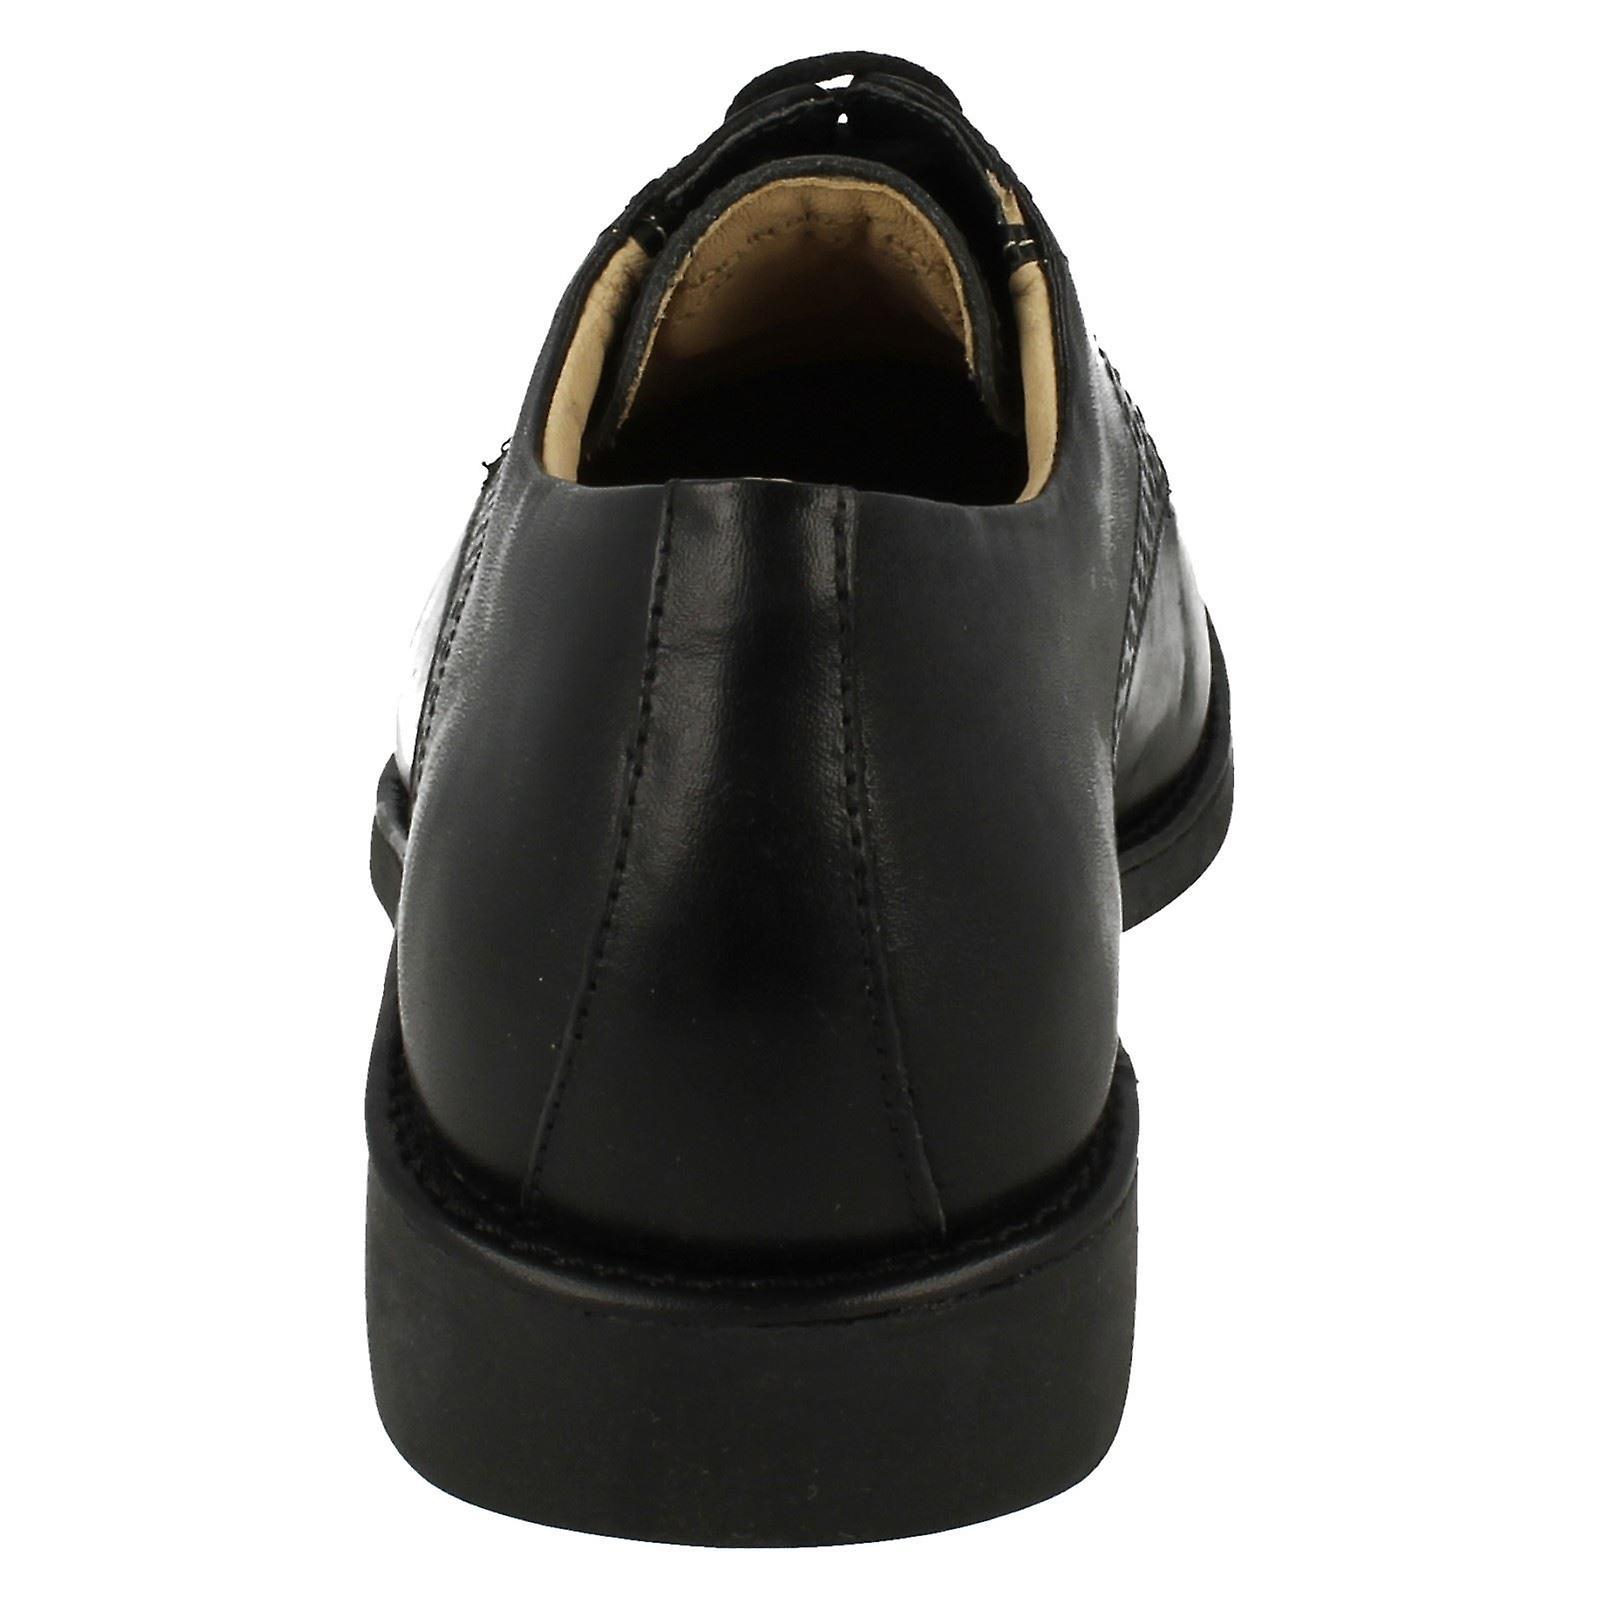 Mens anatomische Brogue detaillierte detaillierte Brogue Schuhe Araras 81c8b0